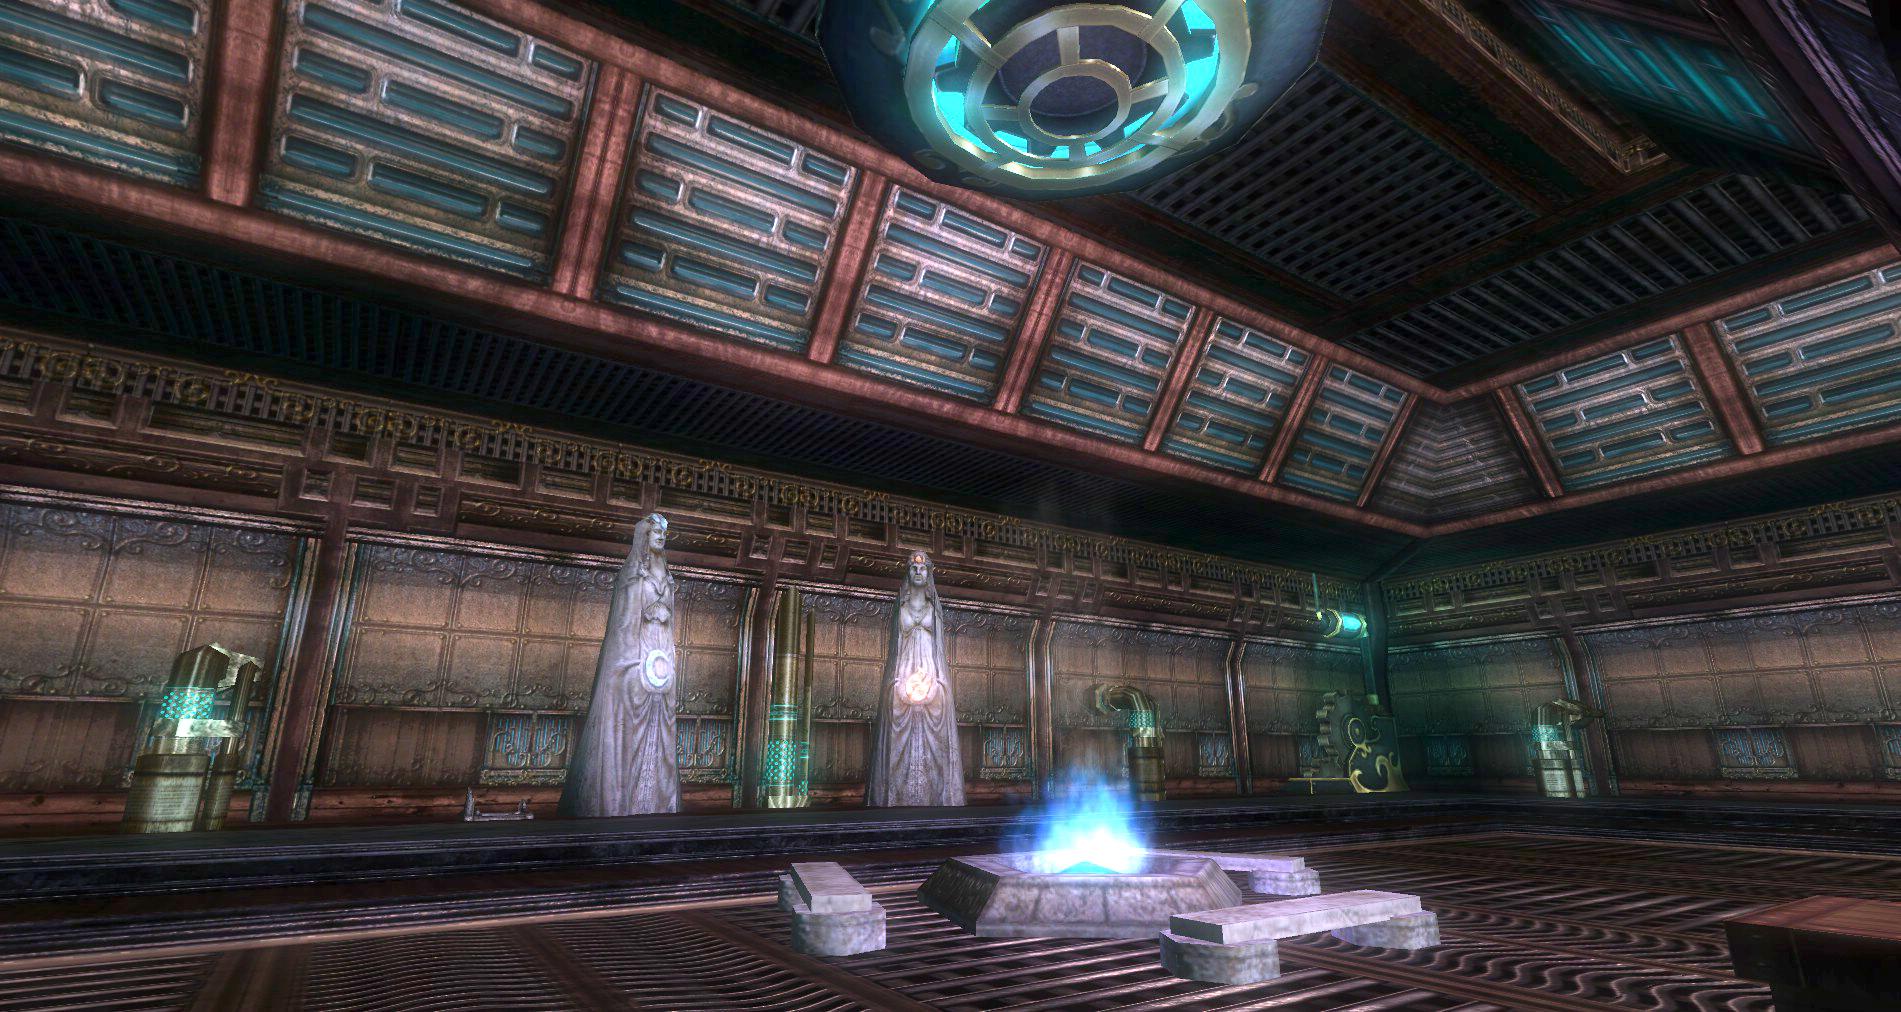 u11-power-play-shrine-room